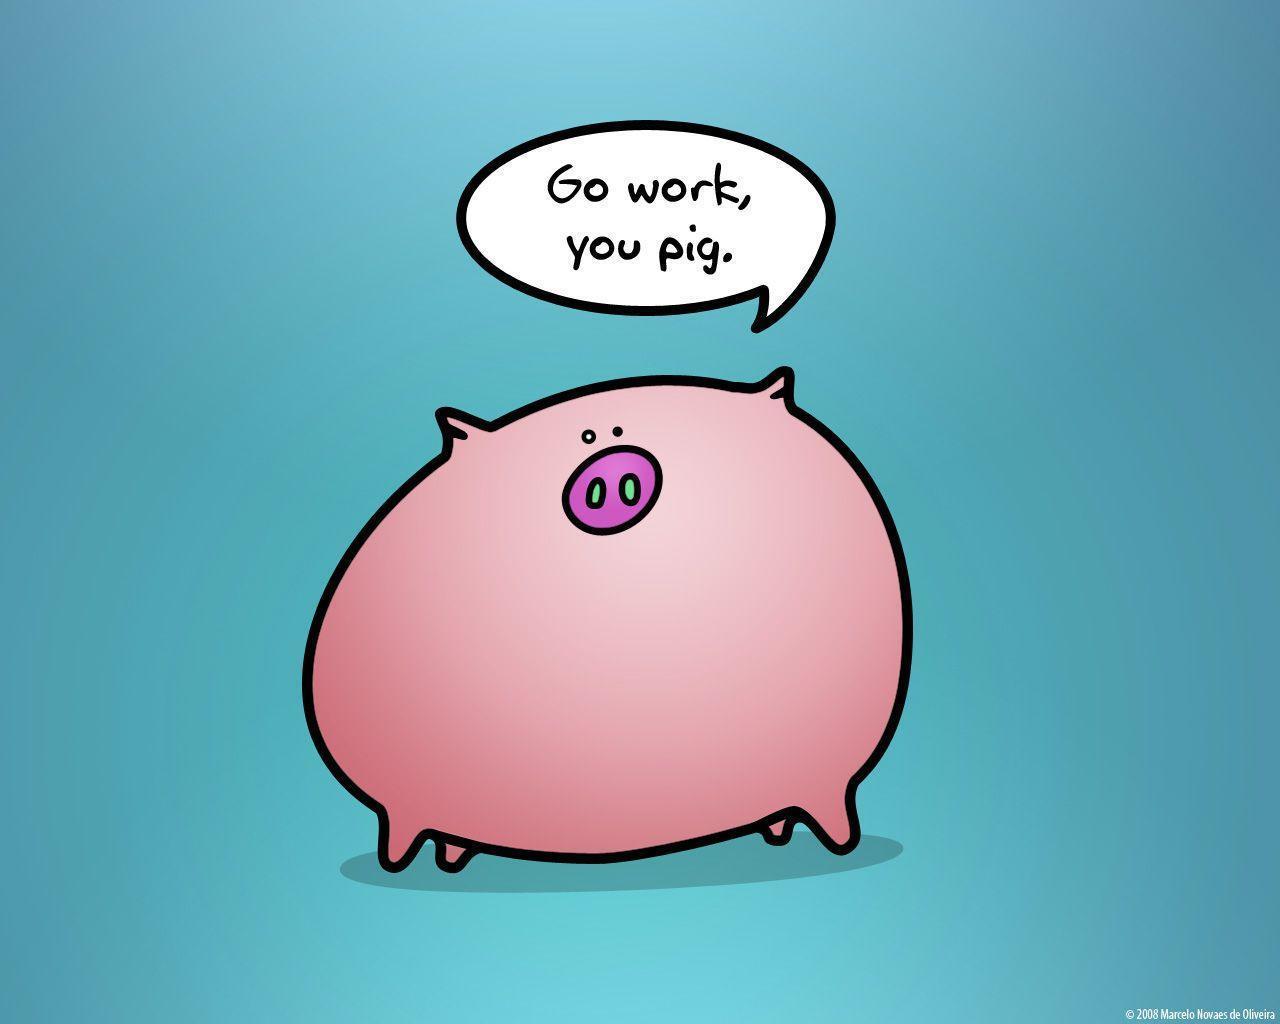 cute pigs cartoon wallpaper - photo #20